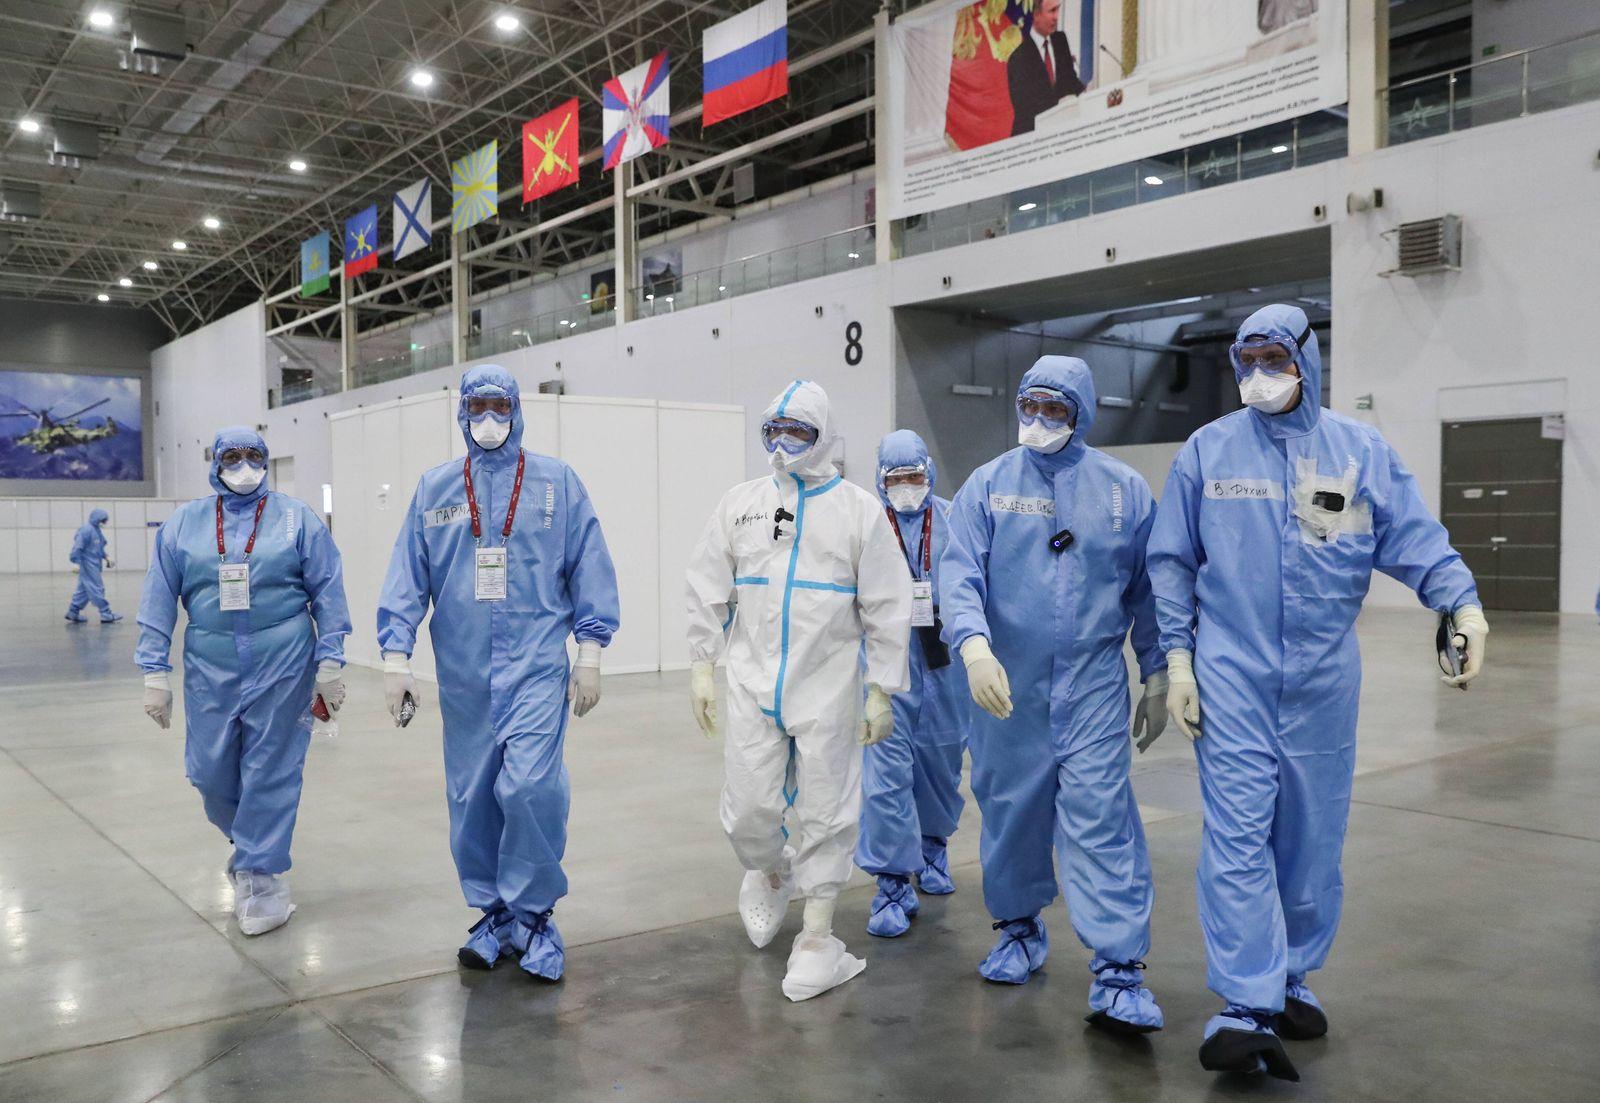 MOSCOW REGION, RUSSIA - NOVEMBER 10, 2020: Moscow Region Governor Andrei Vorobyev (C) visits a temporary medical facili